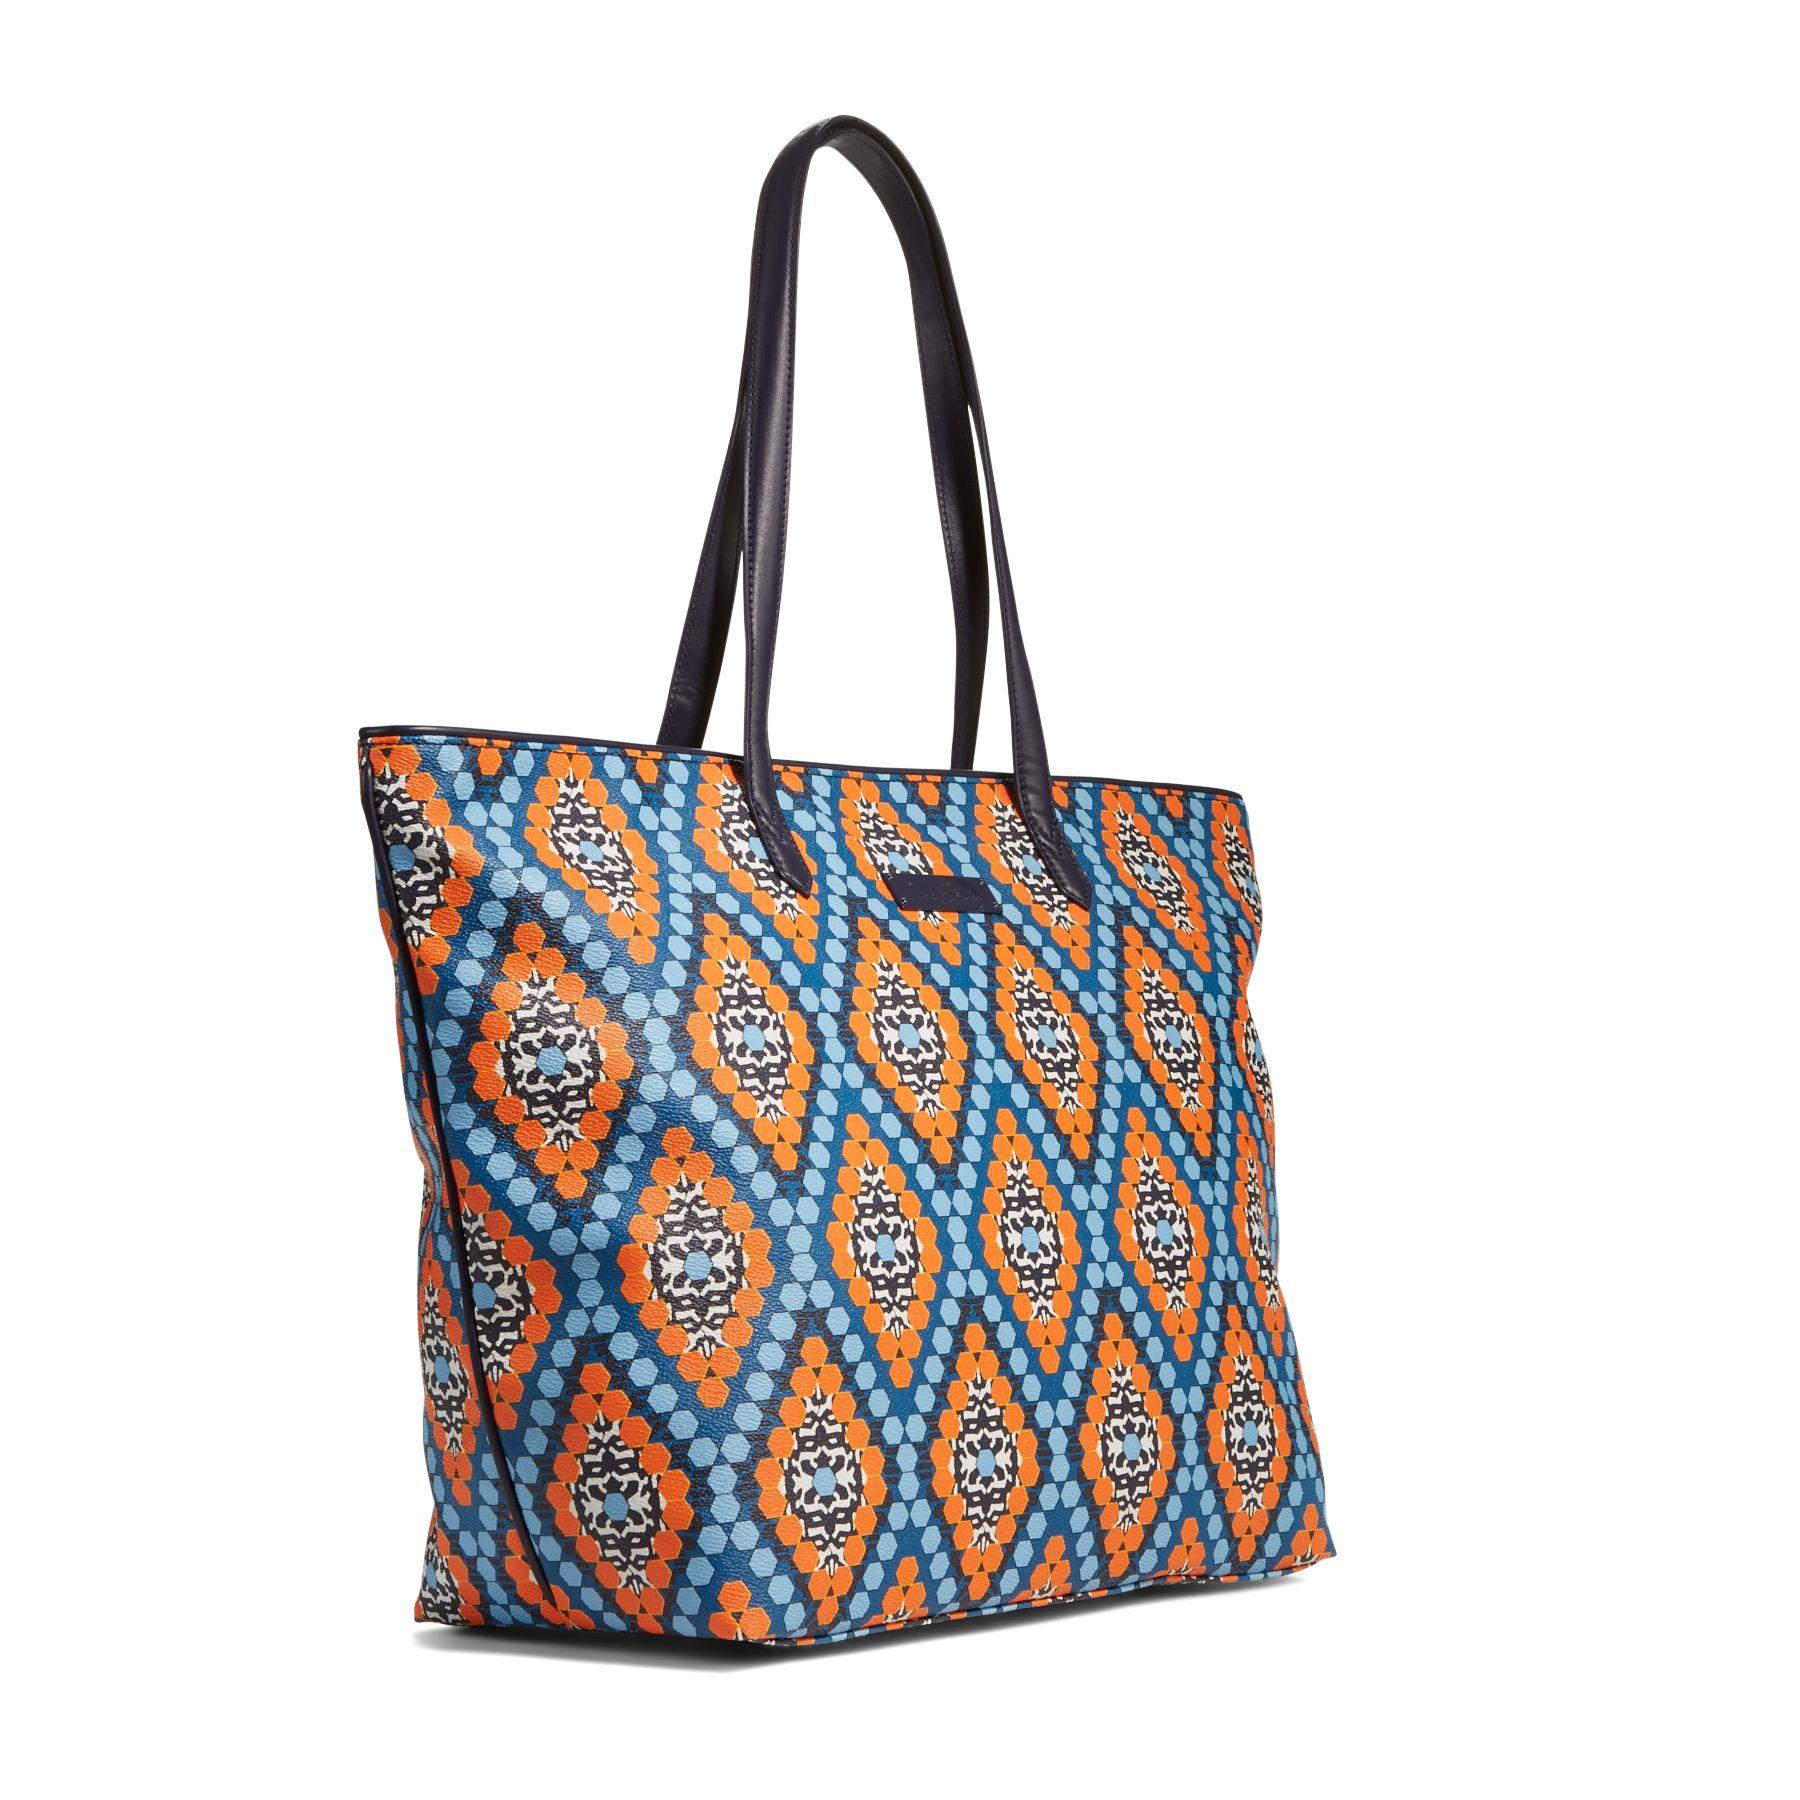 Vera Bradley Big Travel Bag